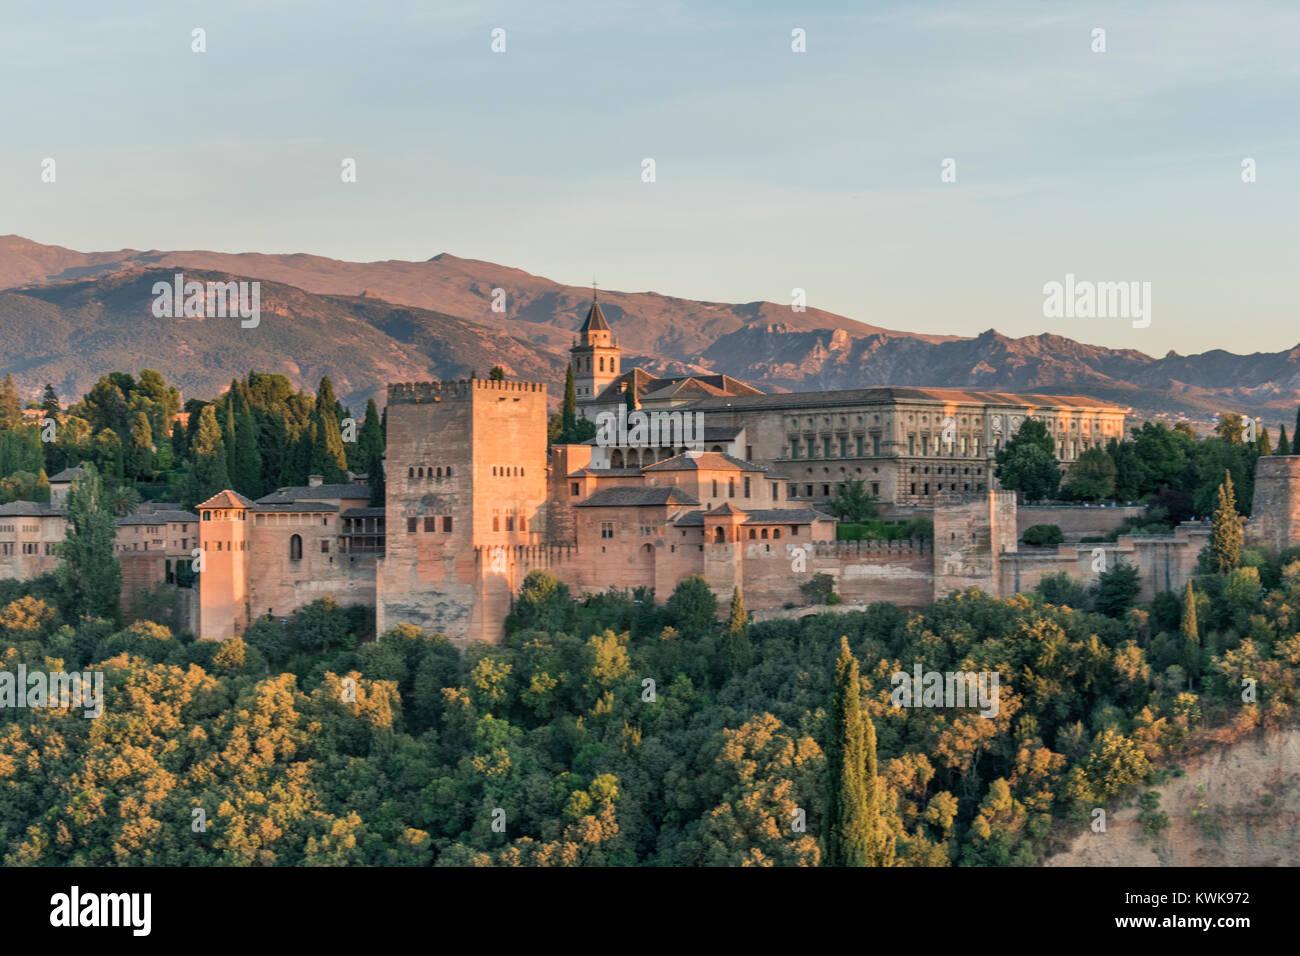 Blick auf die Alhambra vom Mirador de San Nicolas, Granada, Spanien Stockbild